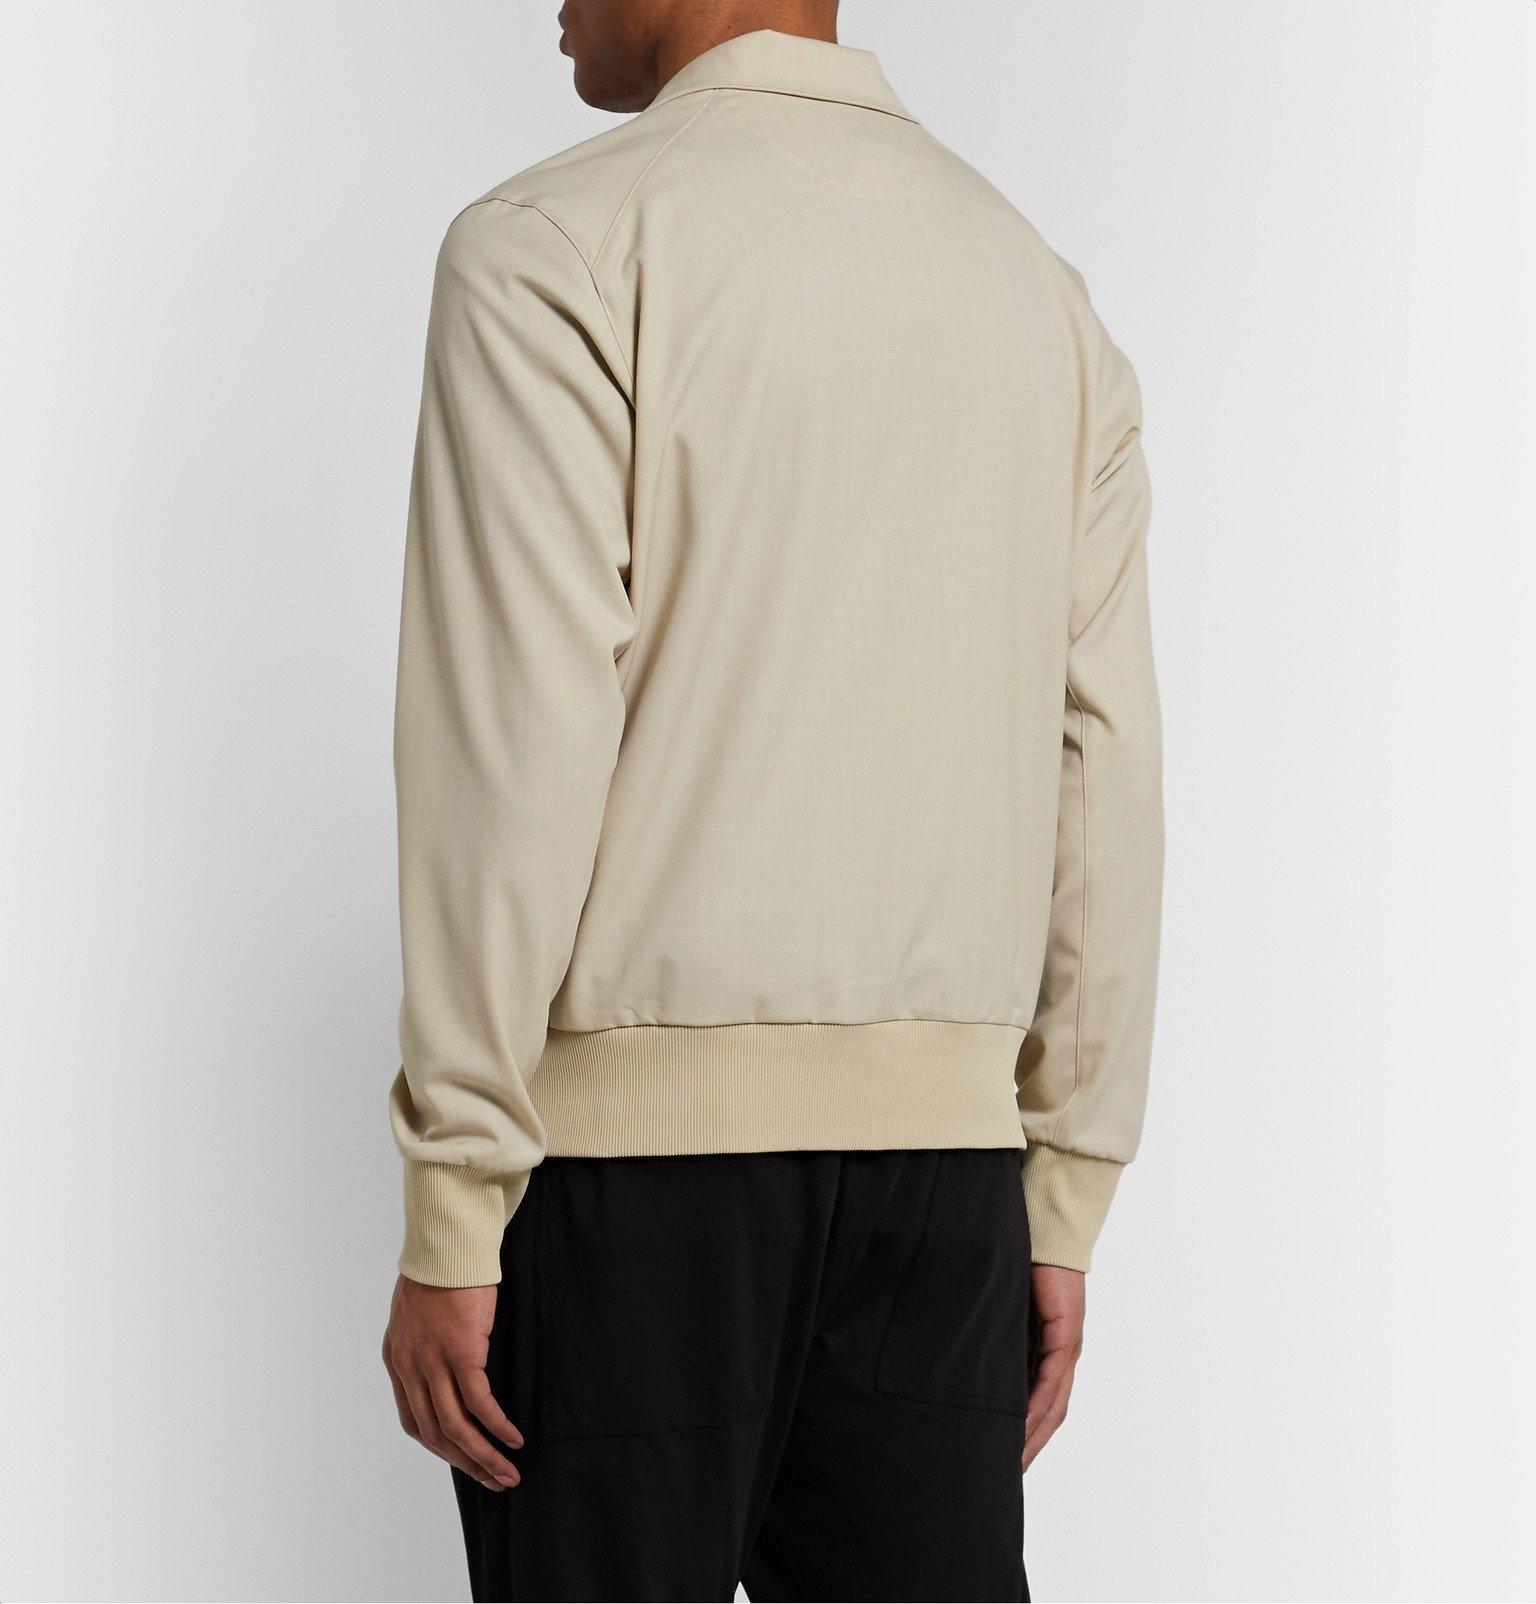 Y-3 - Wool-Blend Track Jacket - Neutrals